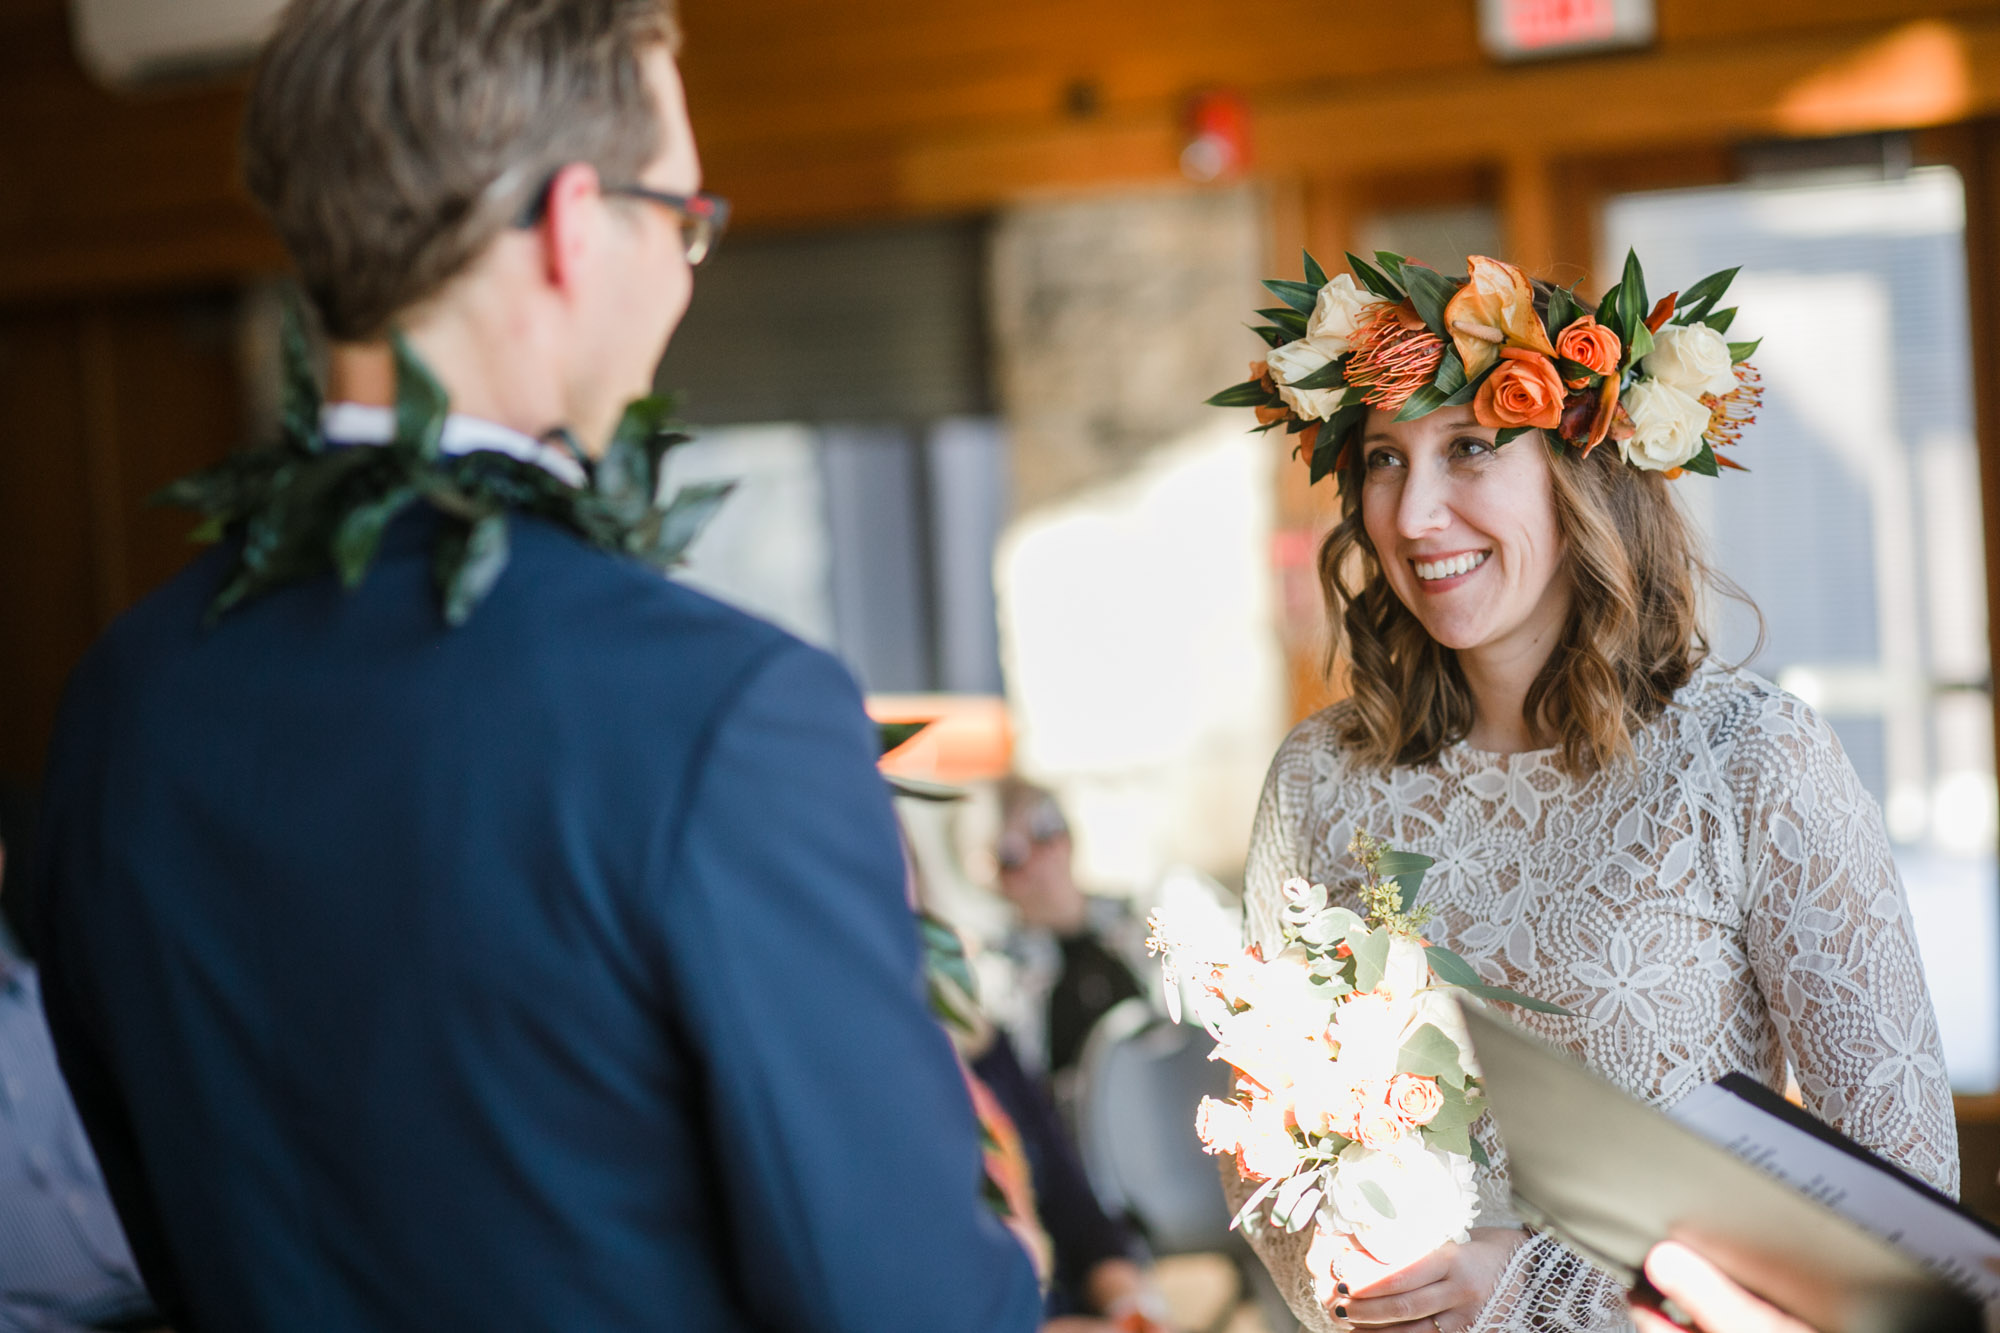 oak-openings-lodge-wedding-8628.jpg